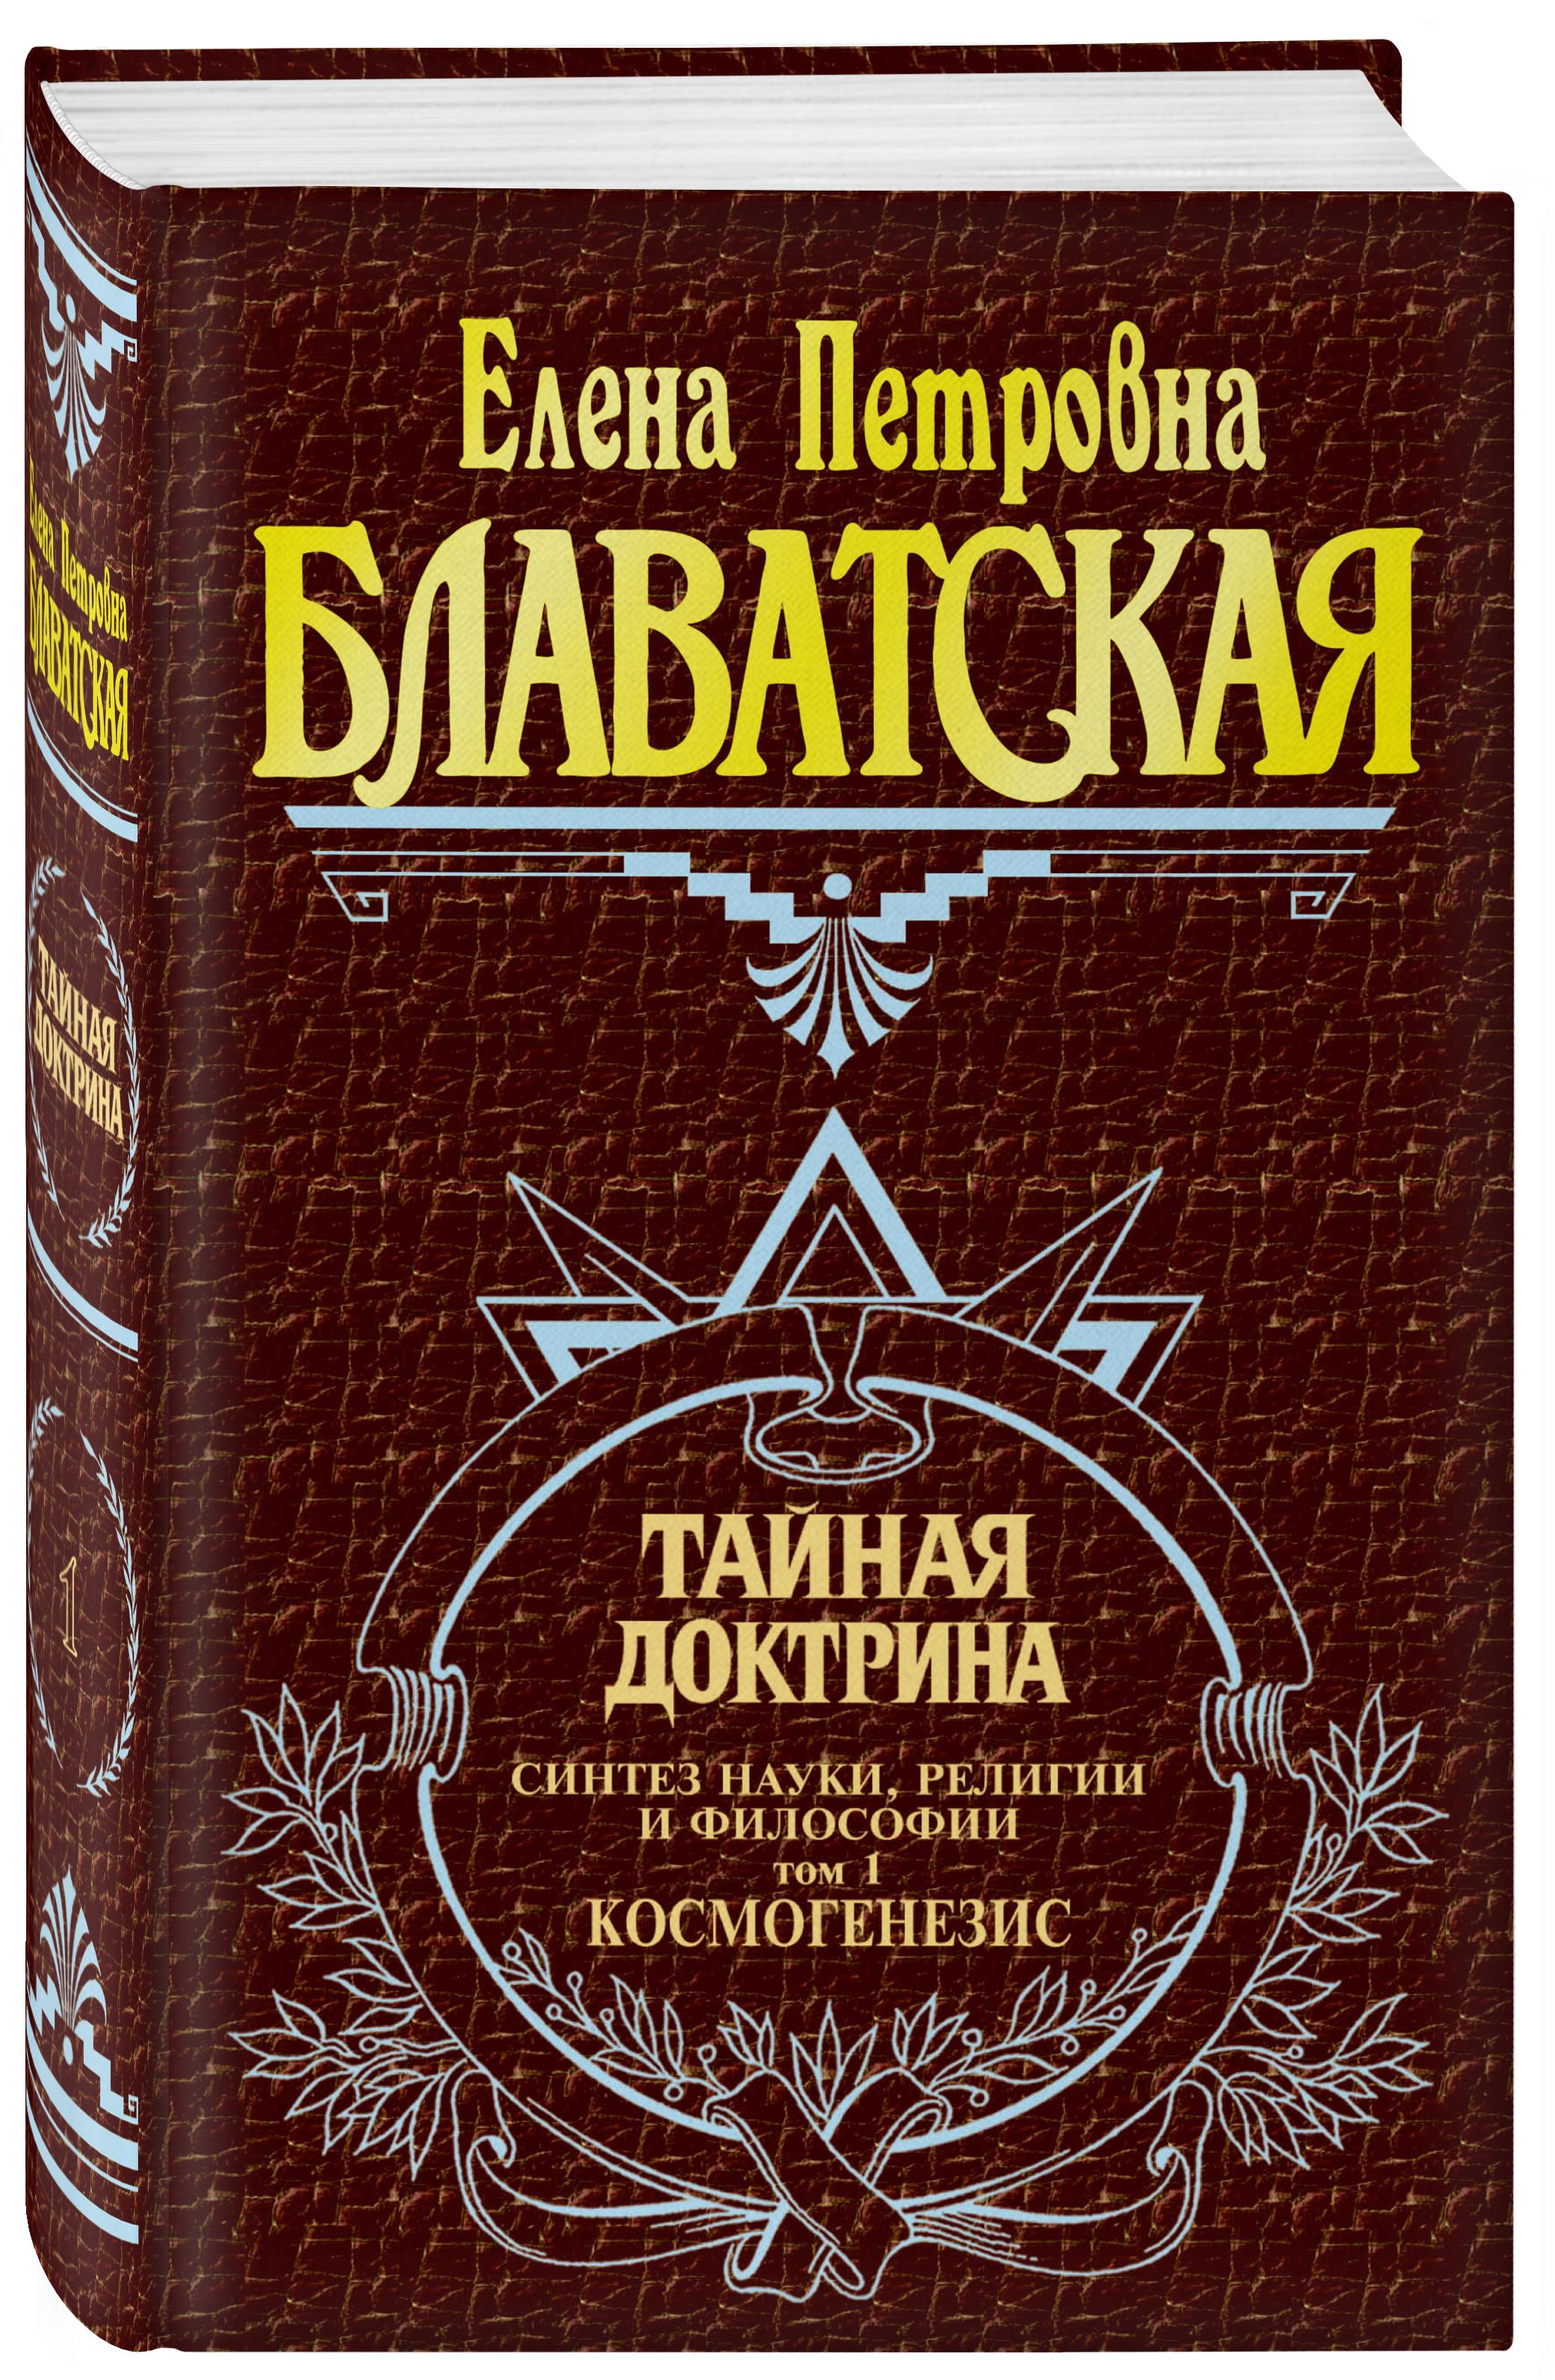 Блаватская Е.П. Тайная доктрина. Т. 1